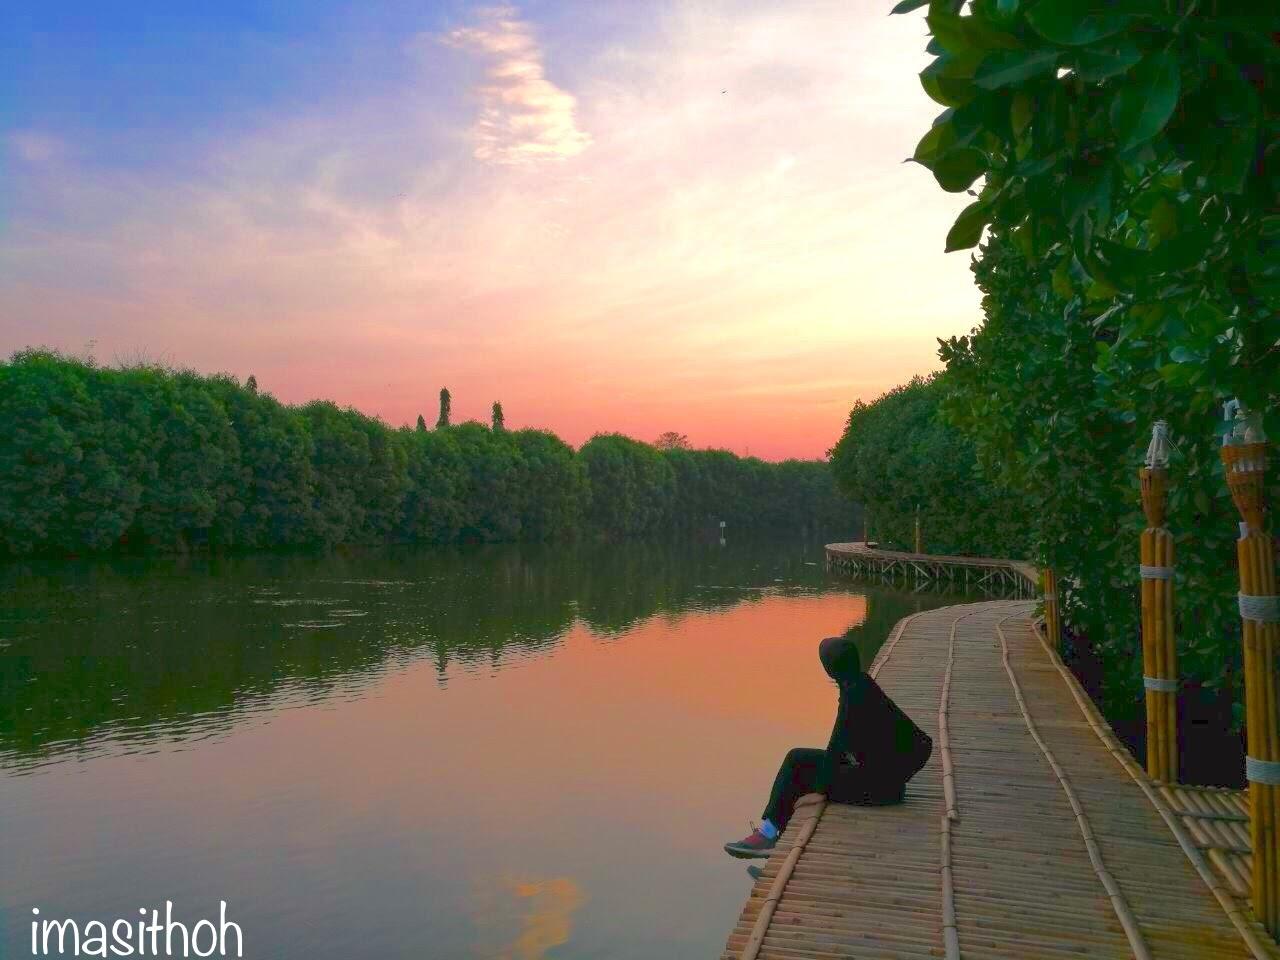 Mangrove PRPP Jawa Tengah